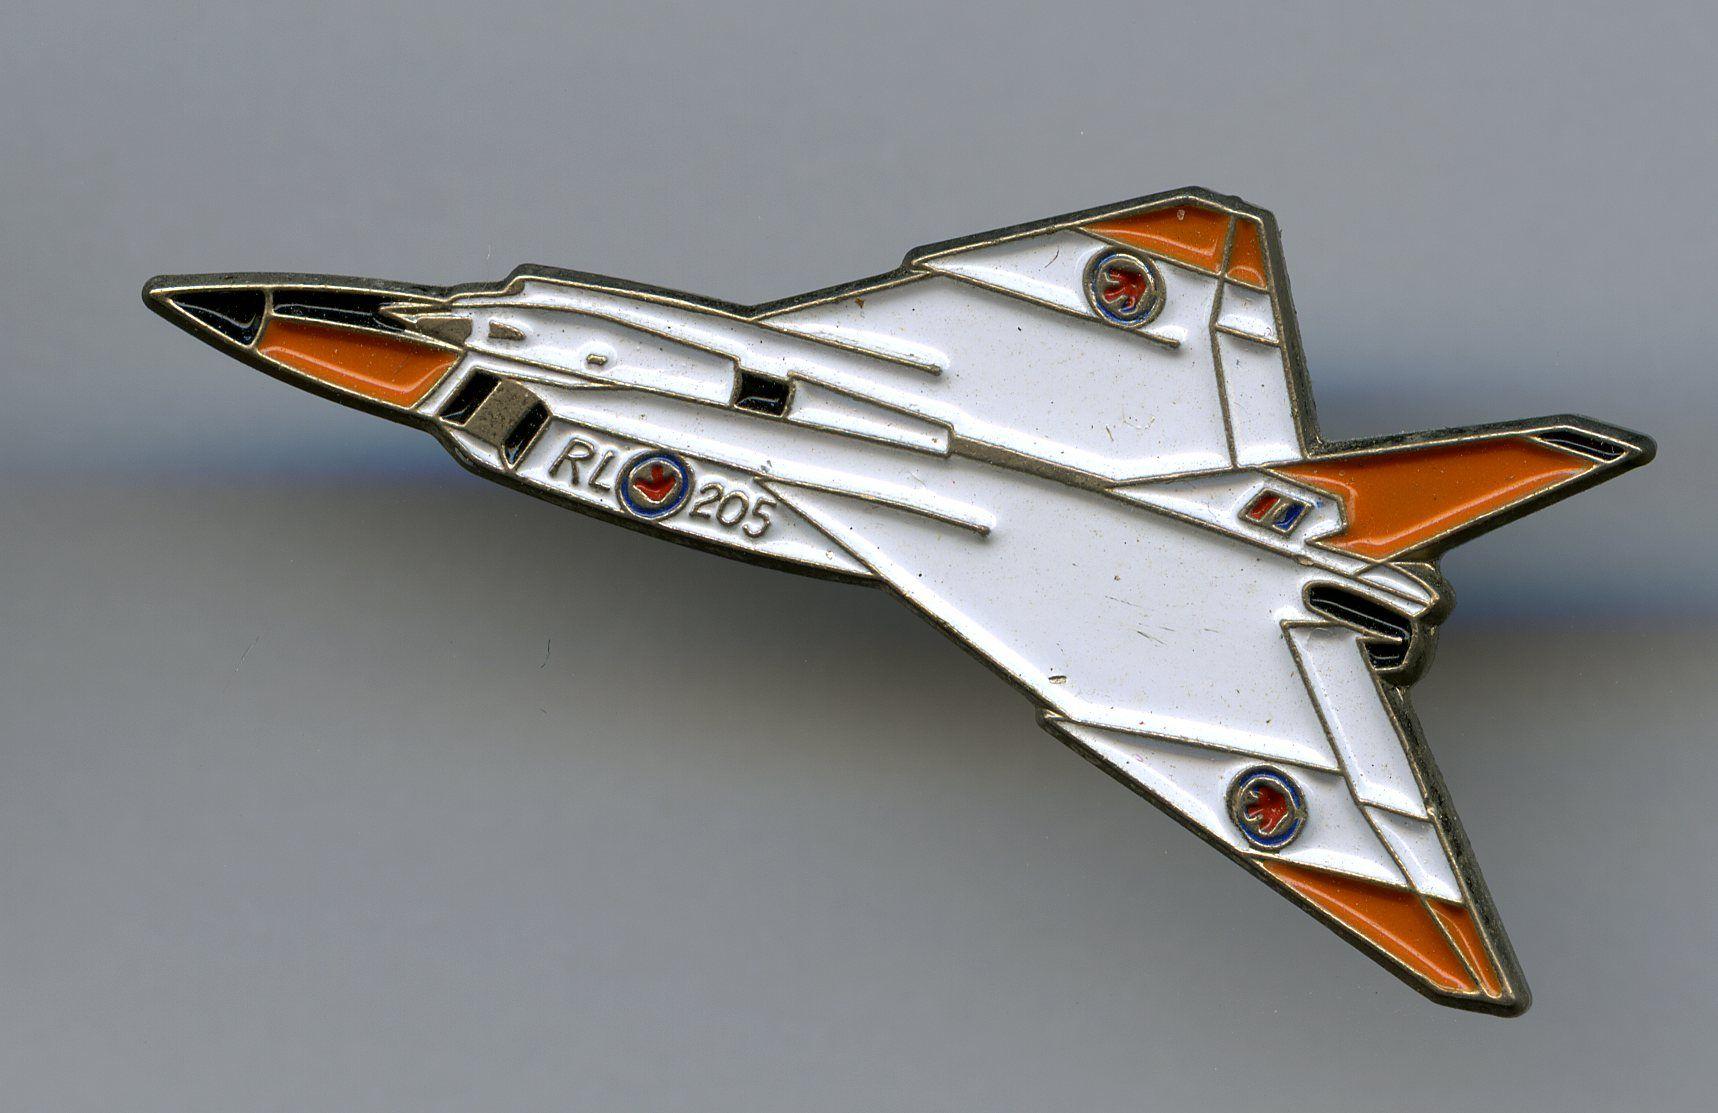 Cf 105 Avro Arrow Pin Avro Arrow Cf 105 Pins Patches